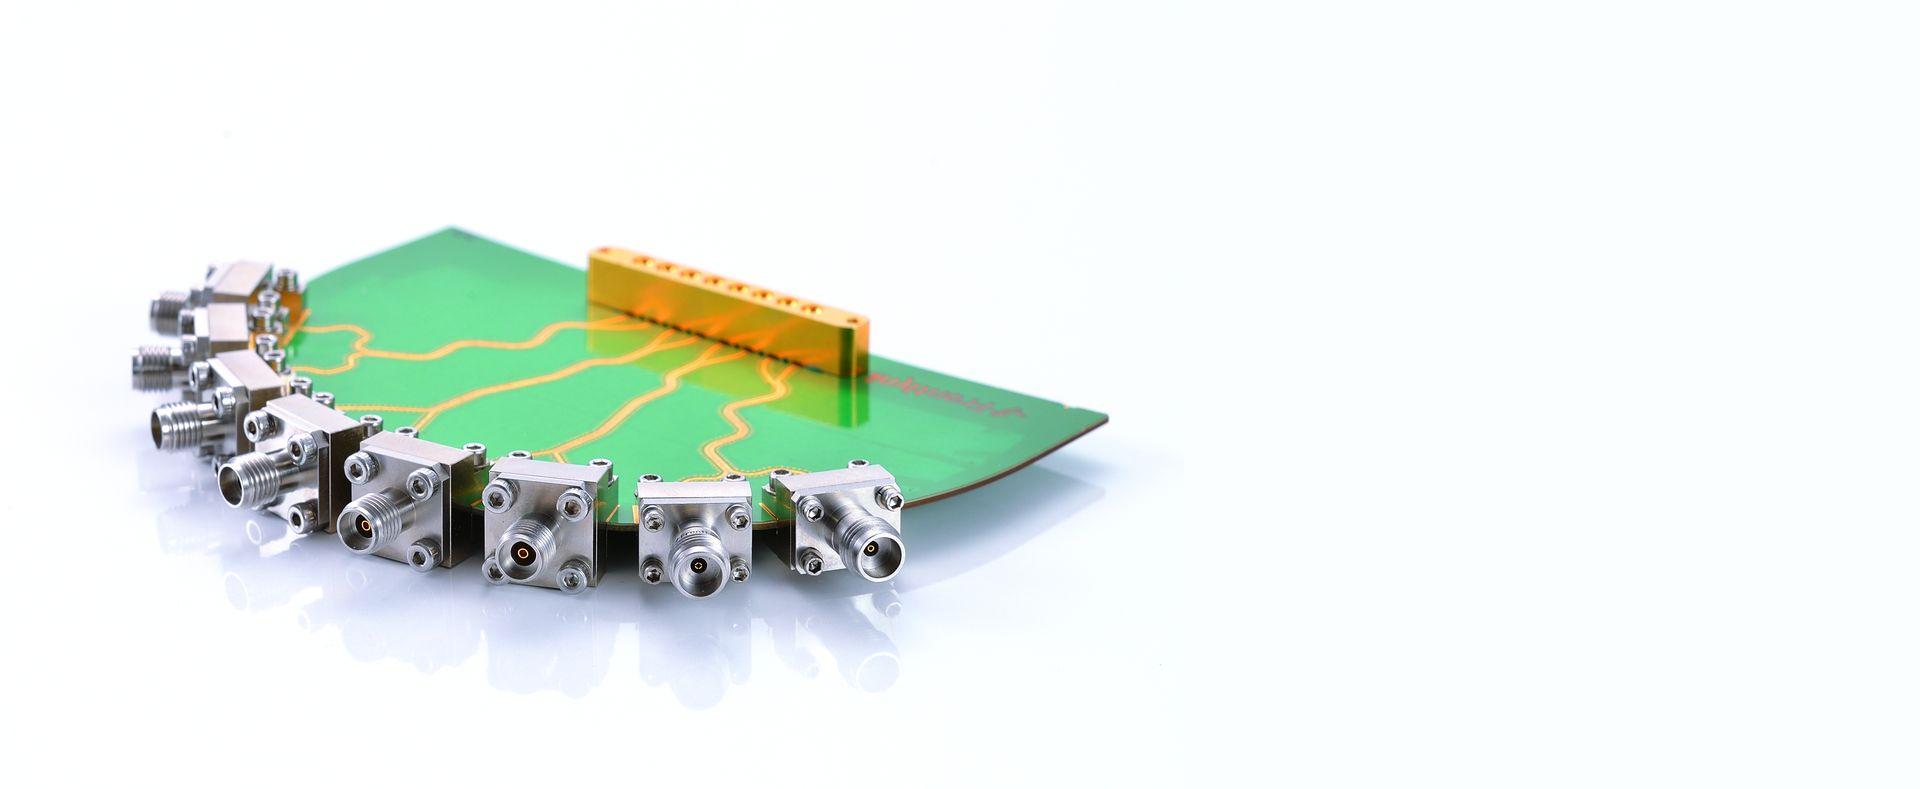 Конец запуска Разъемы Концевые соединители запуска Бо-Цзян, От постоянного тока до 110 ГГц